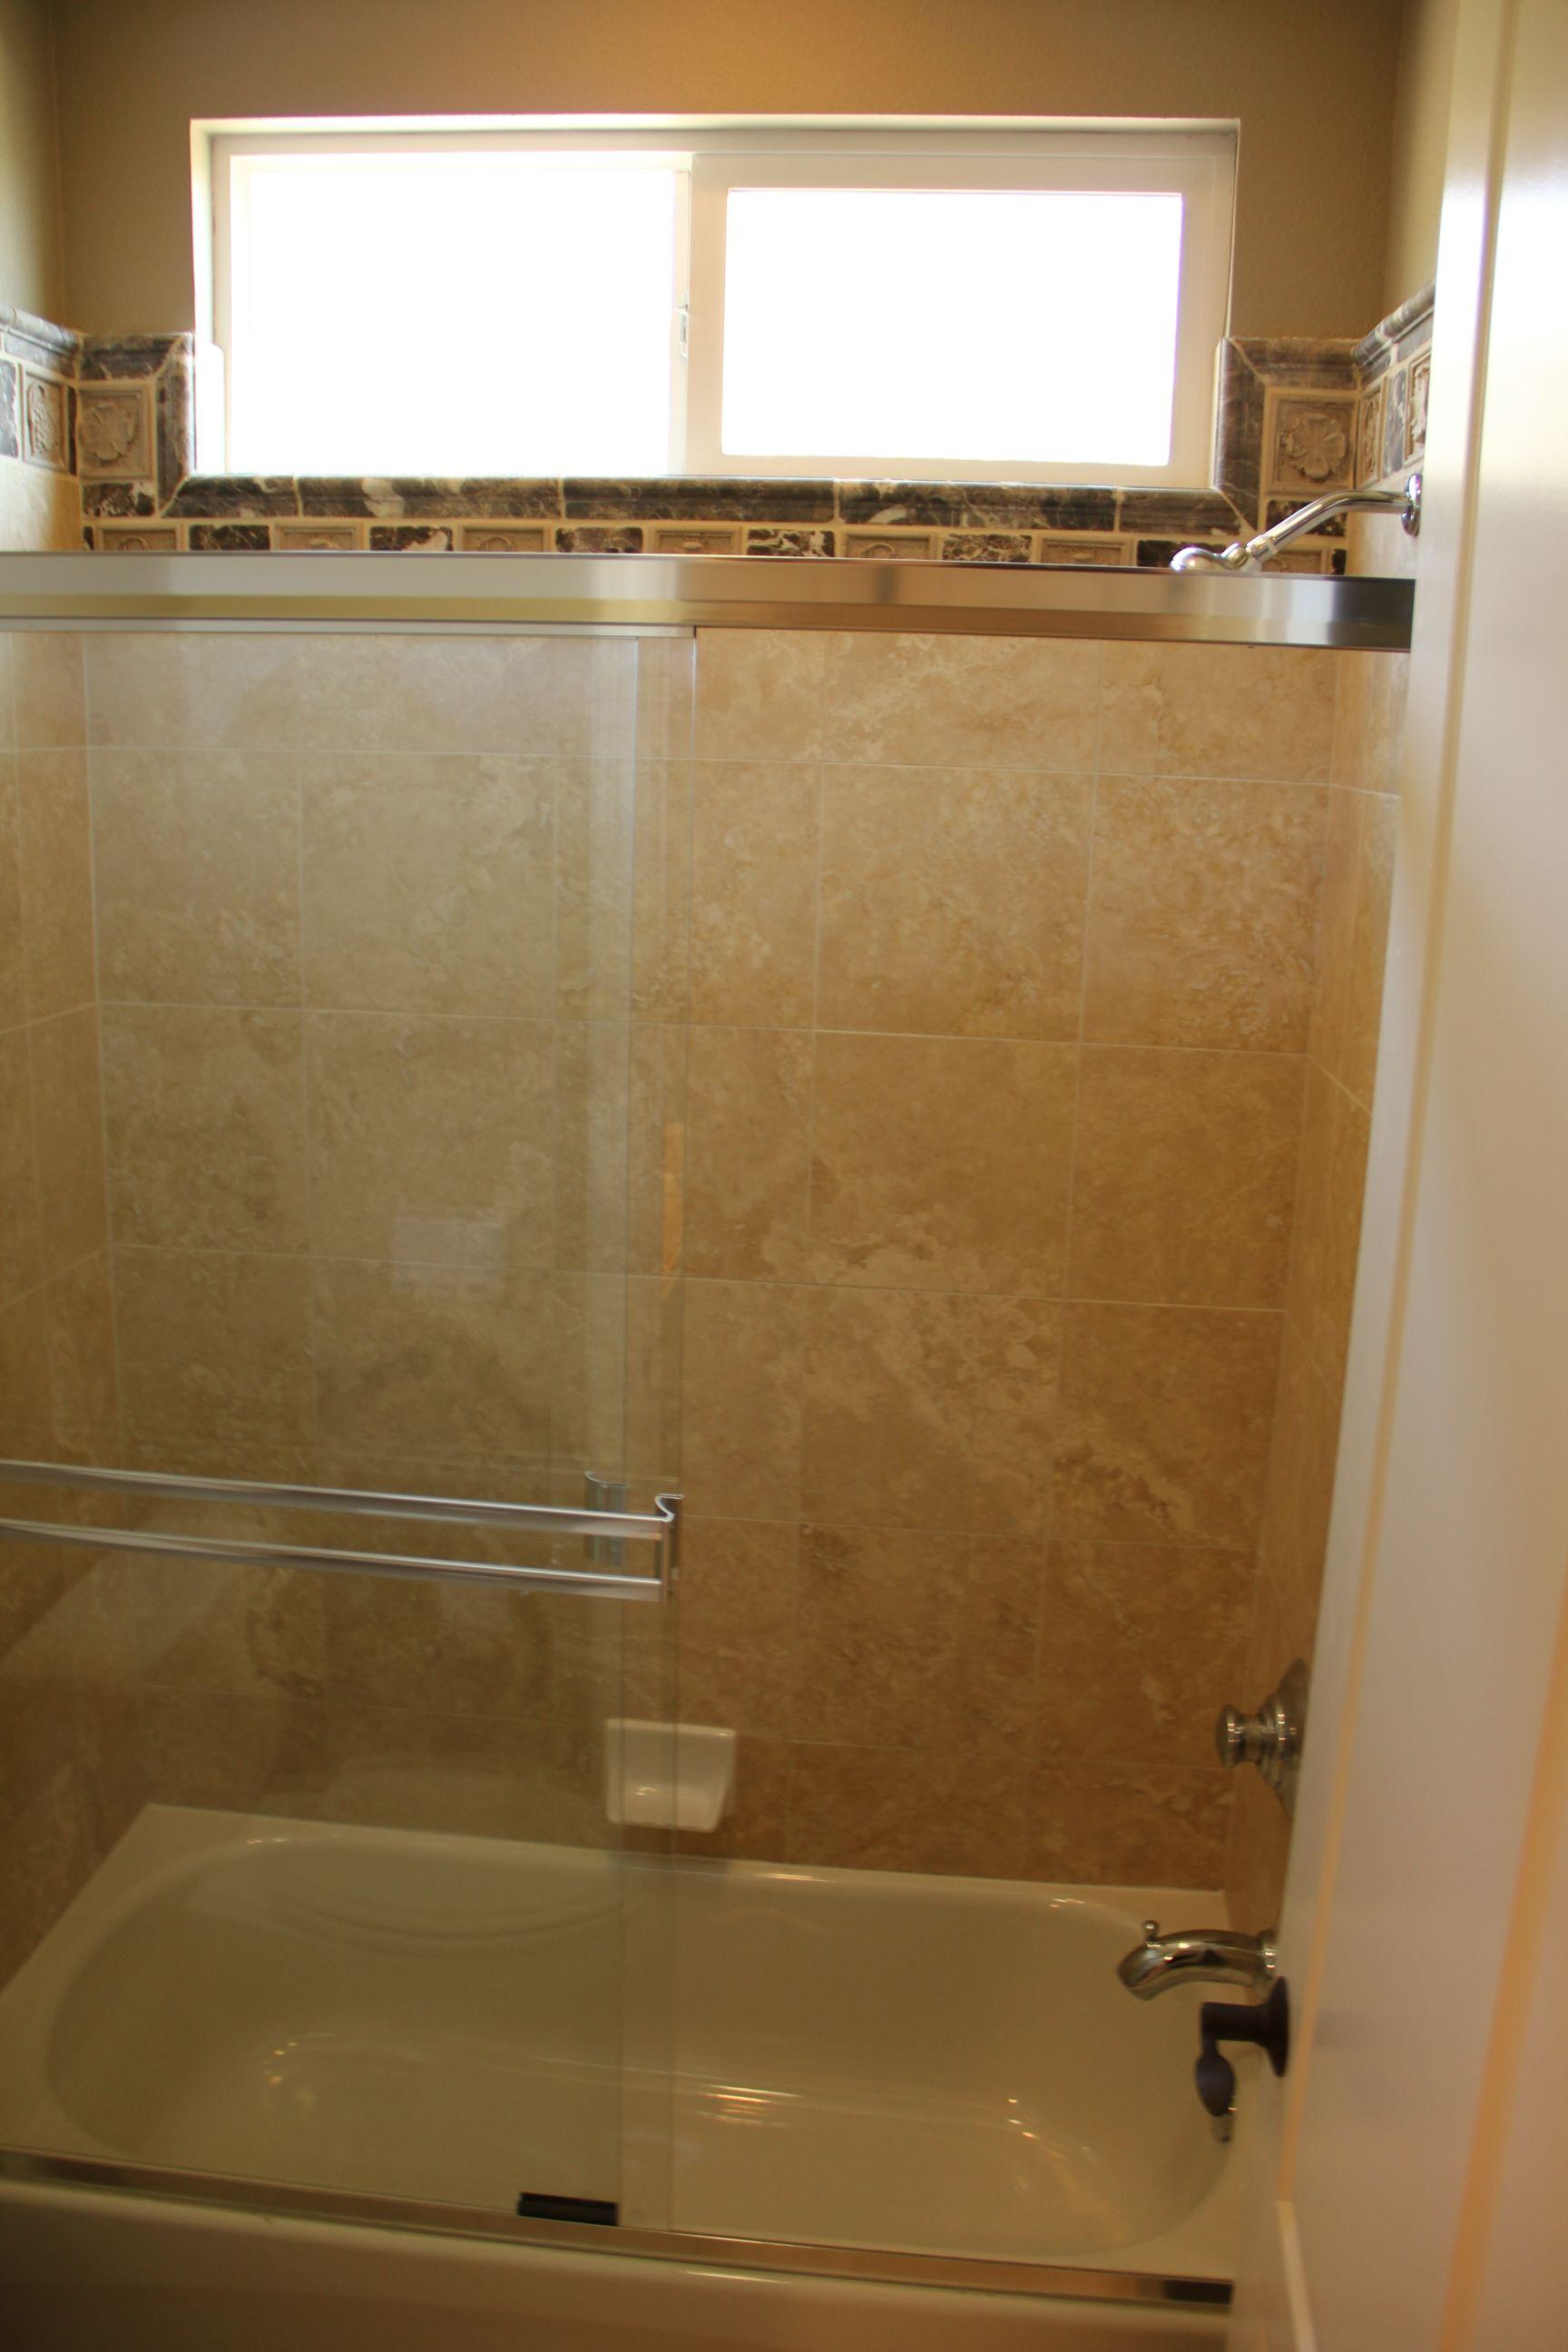 Latest Posts Under Bathroom Exhaust Fan Cover Bathroom Design - Bathroom window fan vent for bathroom decor ideas